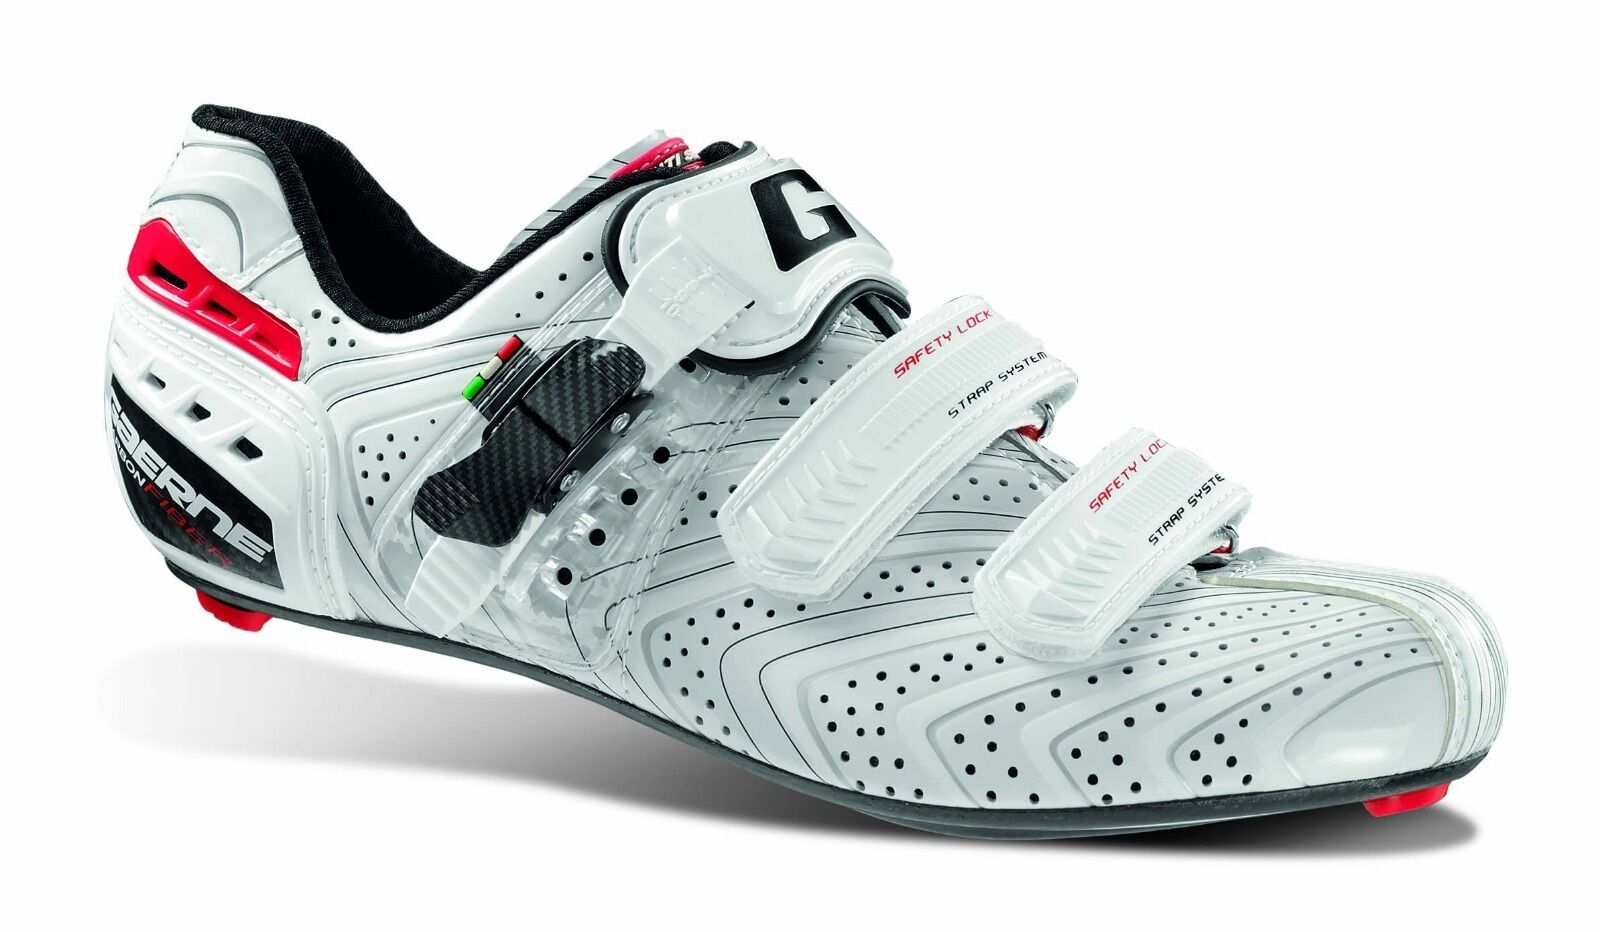 Gaerne autobon G.Mythos Plus Men's Cycling sautope  bianca Dimensione 44 Retail  450